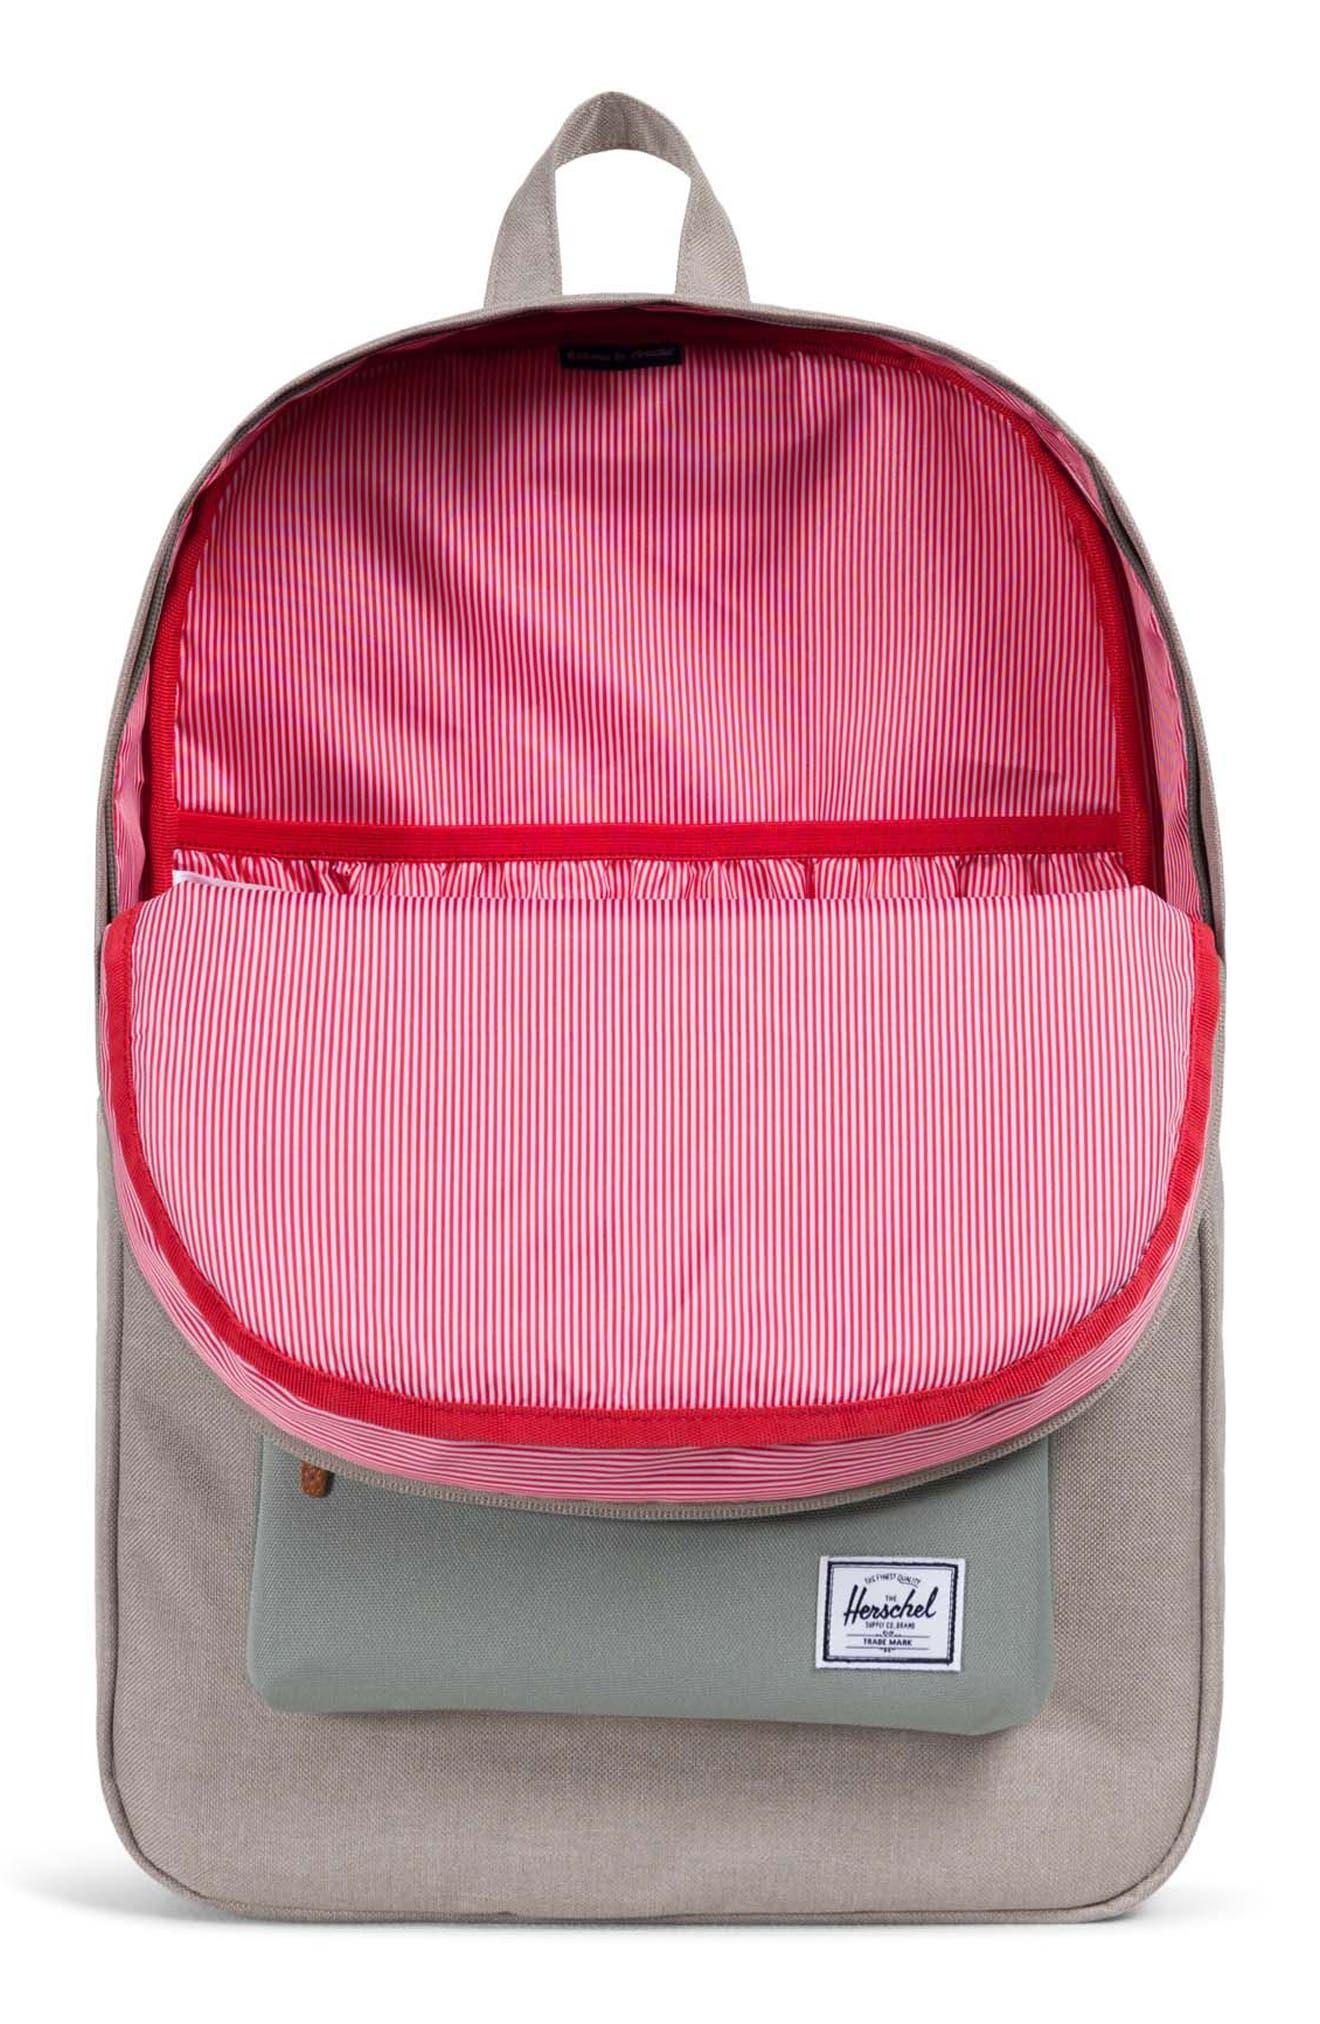 Heritage Backpack,                             Alternate thumbnail 3, color,                             Khaki/ Shadow/ Brick Red/ Tan